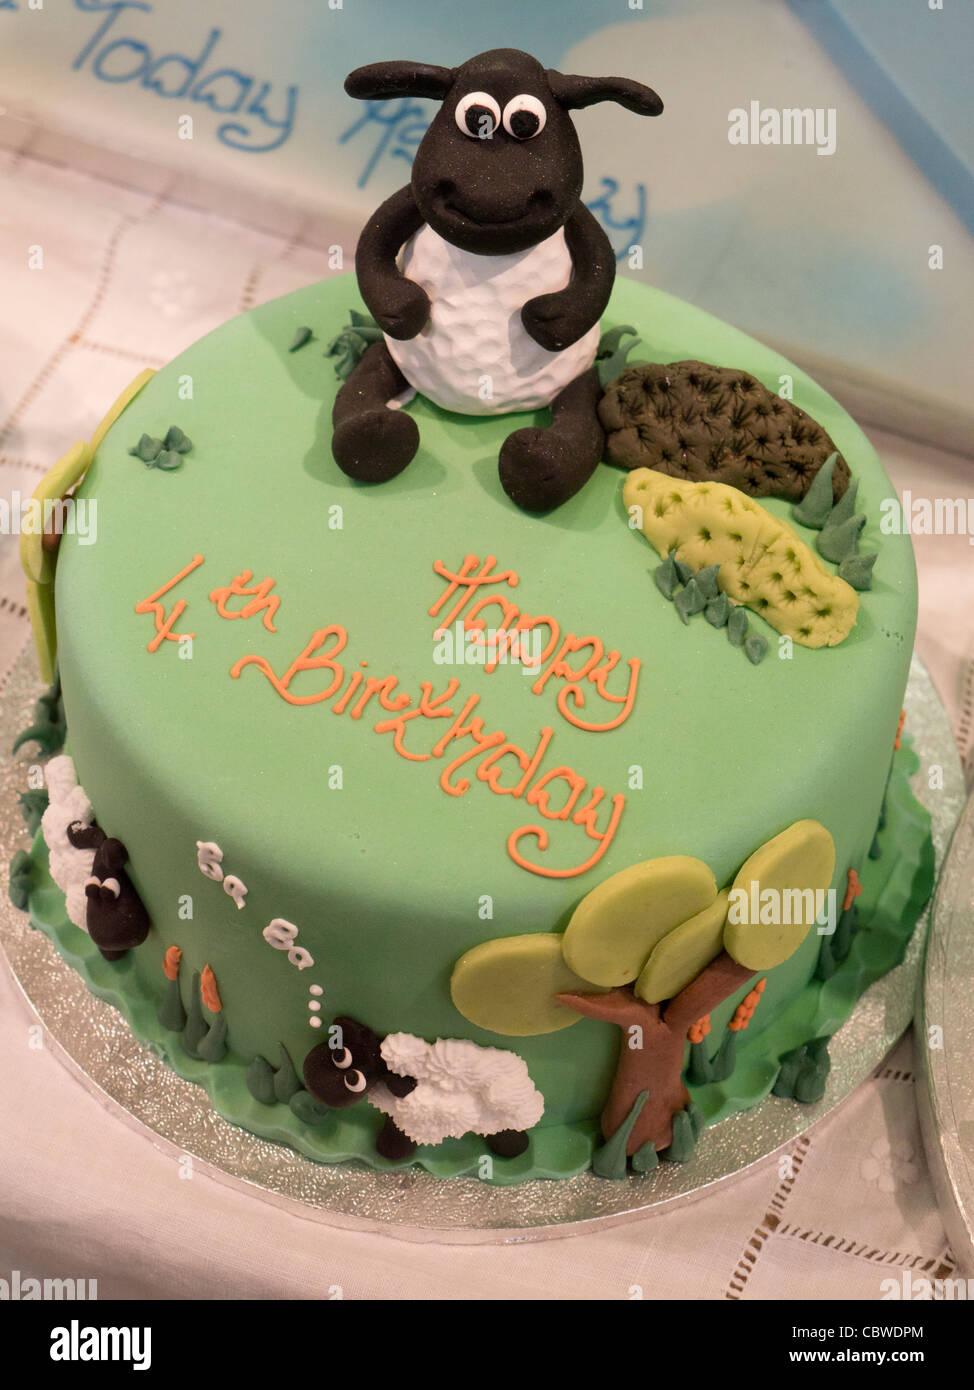 Imaginative Sheep Themed Birthday Cake Oxford Covered Market Stock